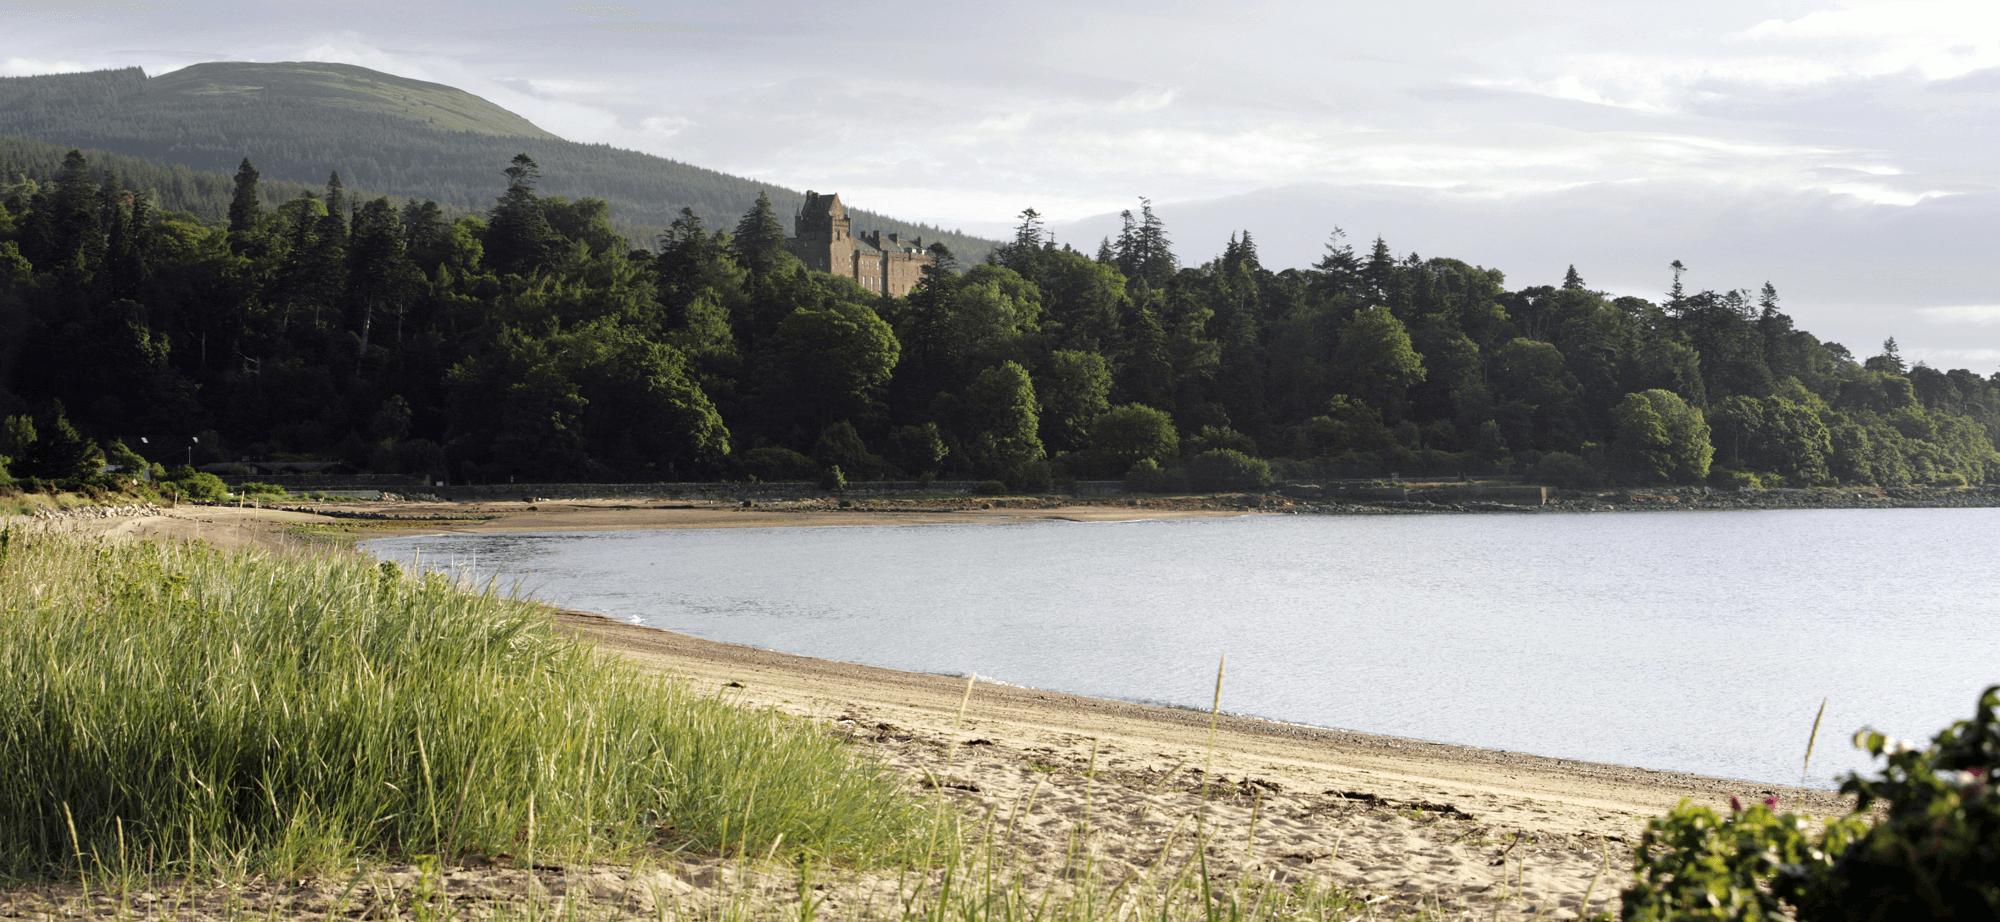 Brodick-beach-with-view-towards-brodick-castle-isle-arran